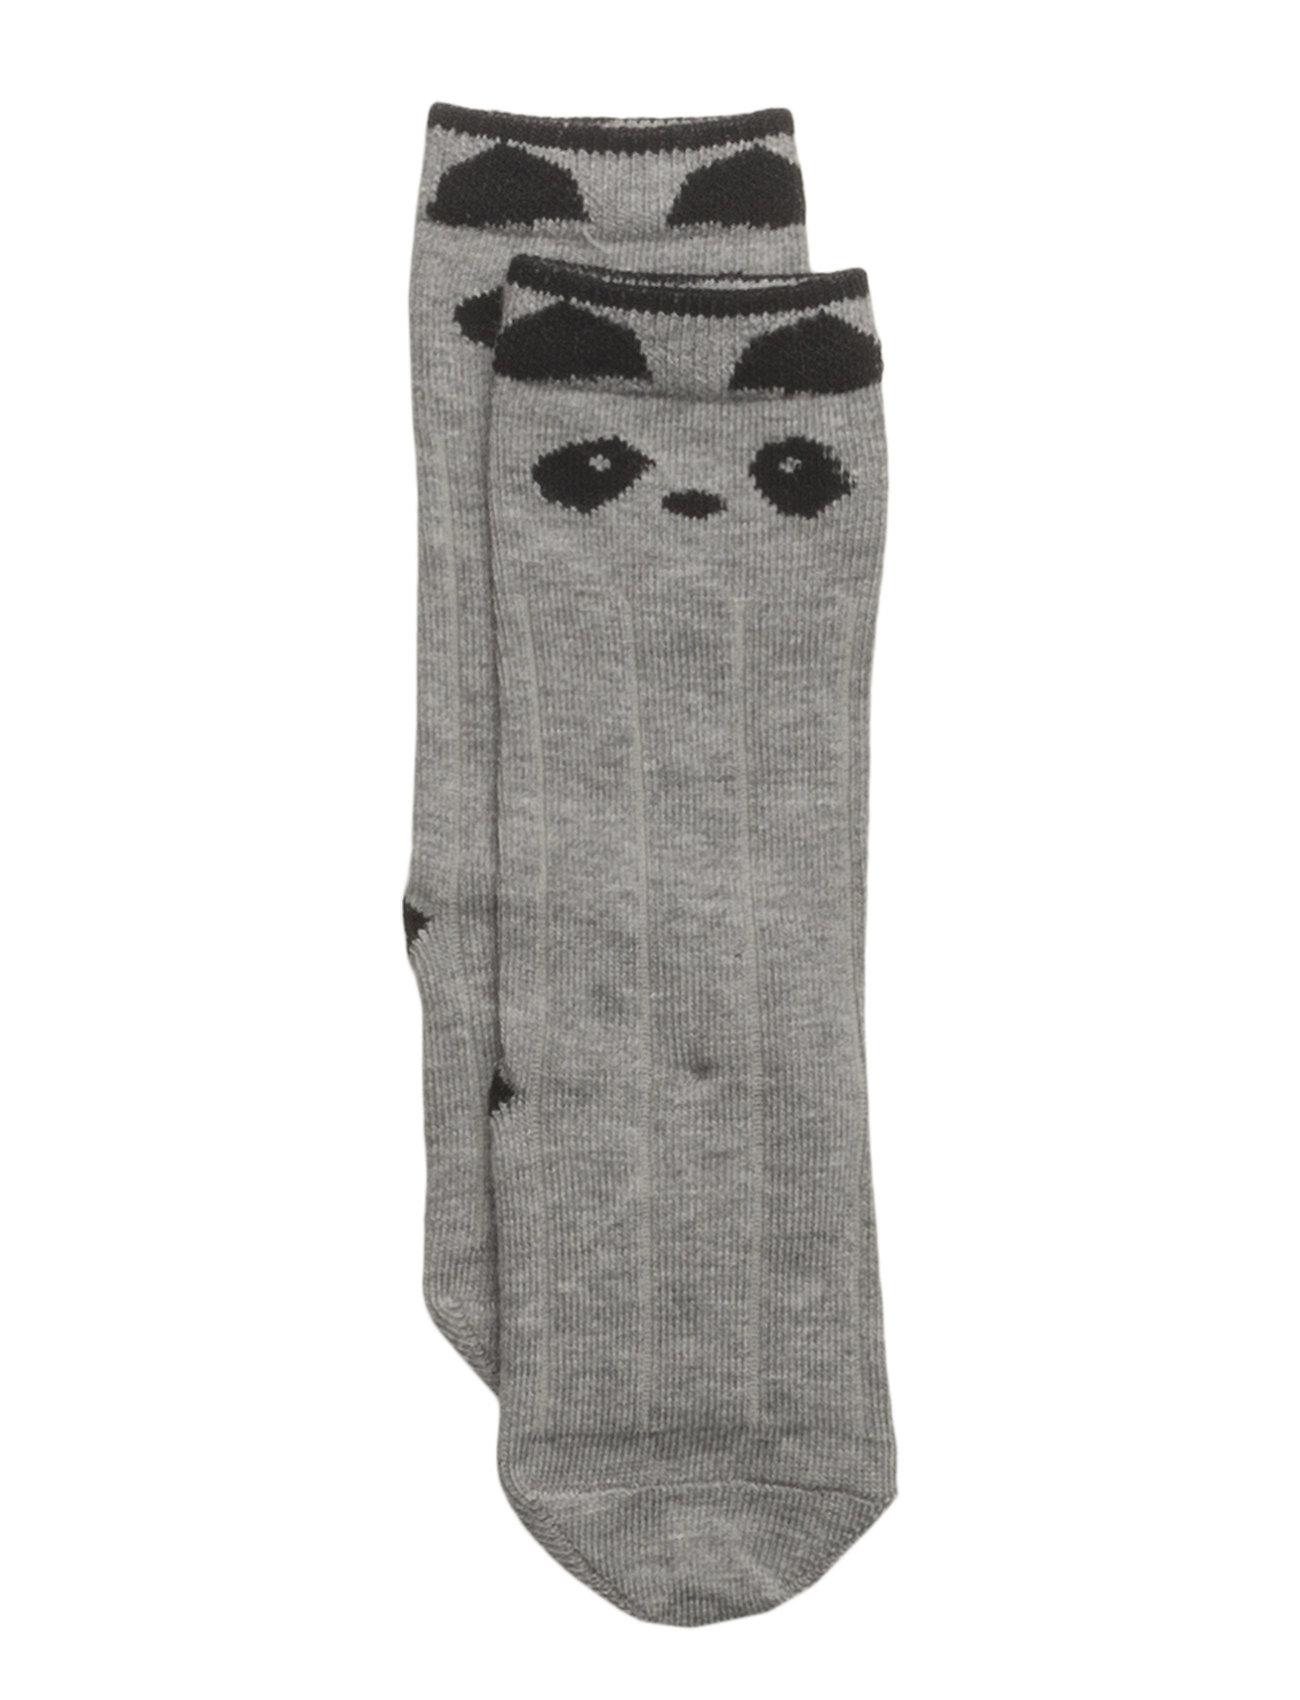 Liewood Sofia knee socks - PANDA GREY MELANGE